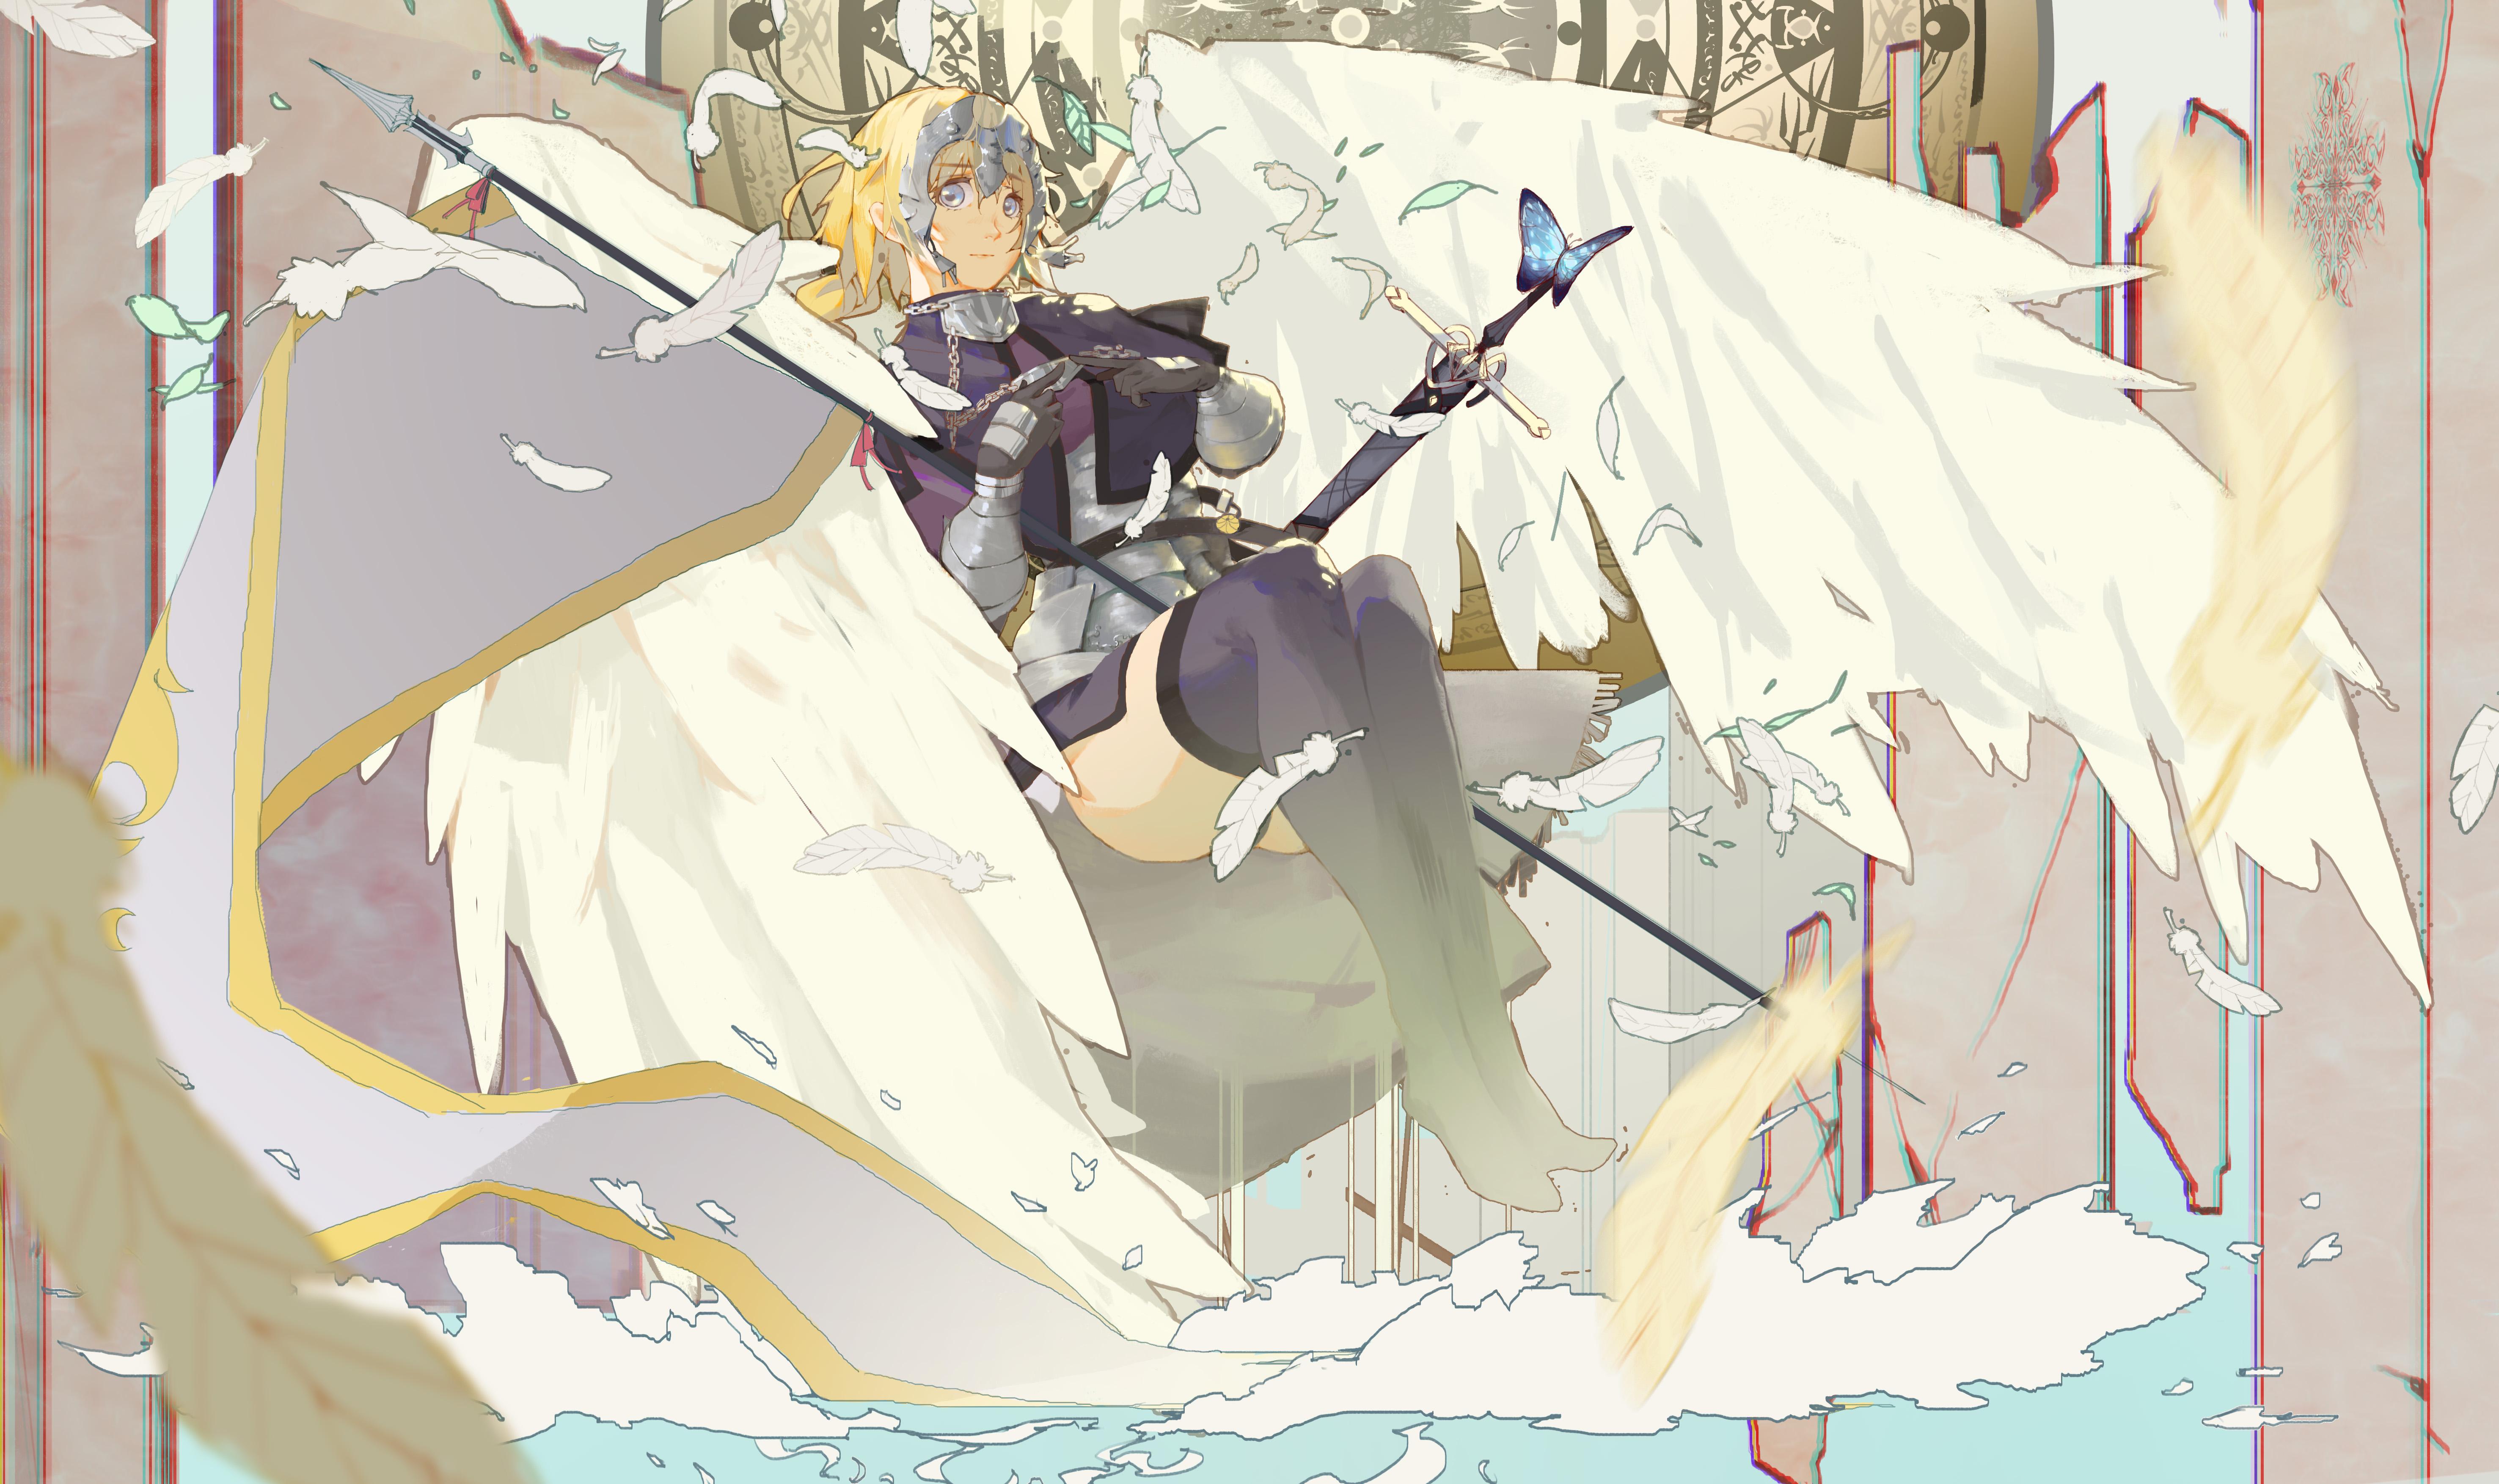 Fate Series Fate Apocrypha anime girls Ruler Fate Apocrypha